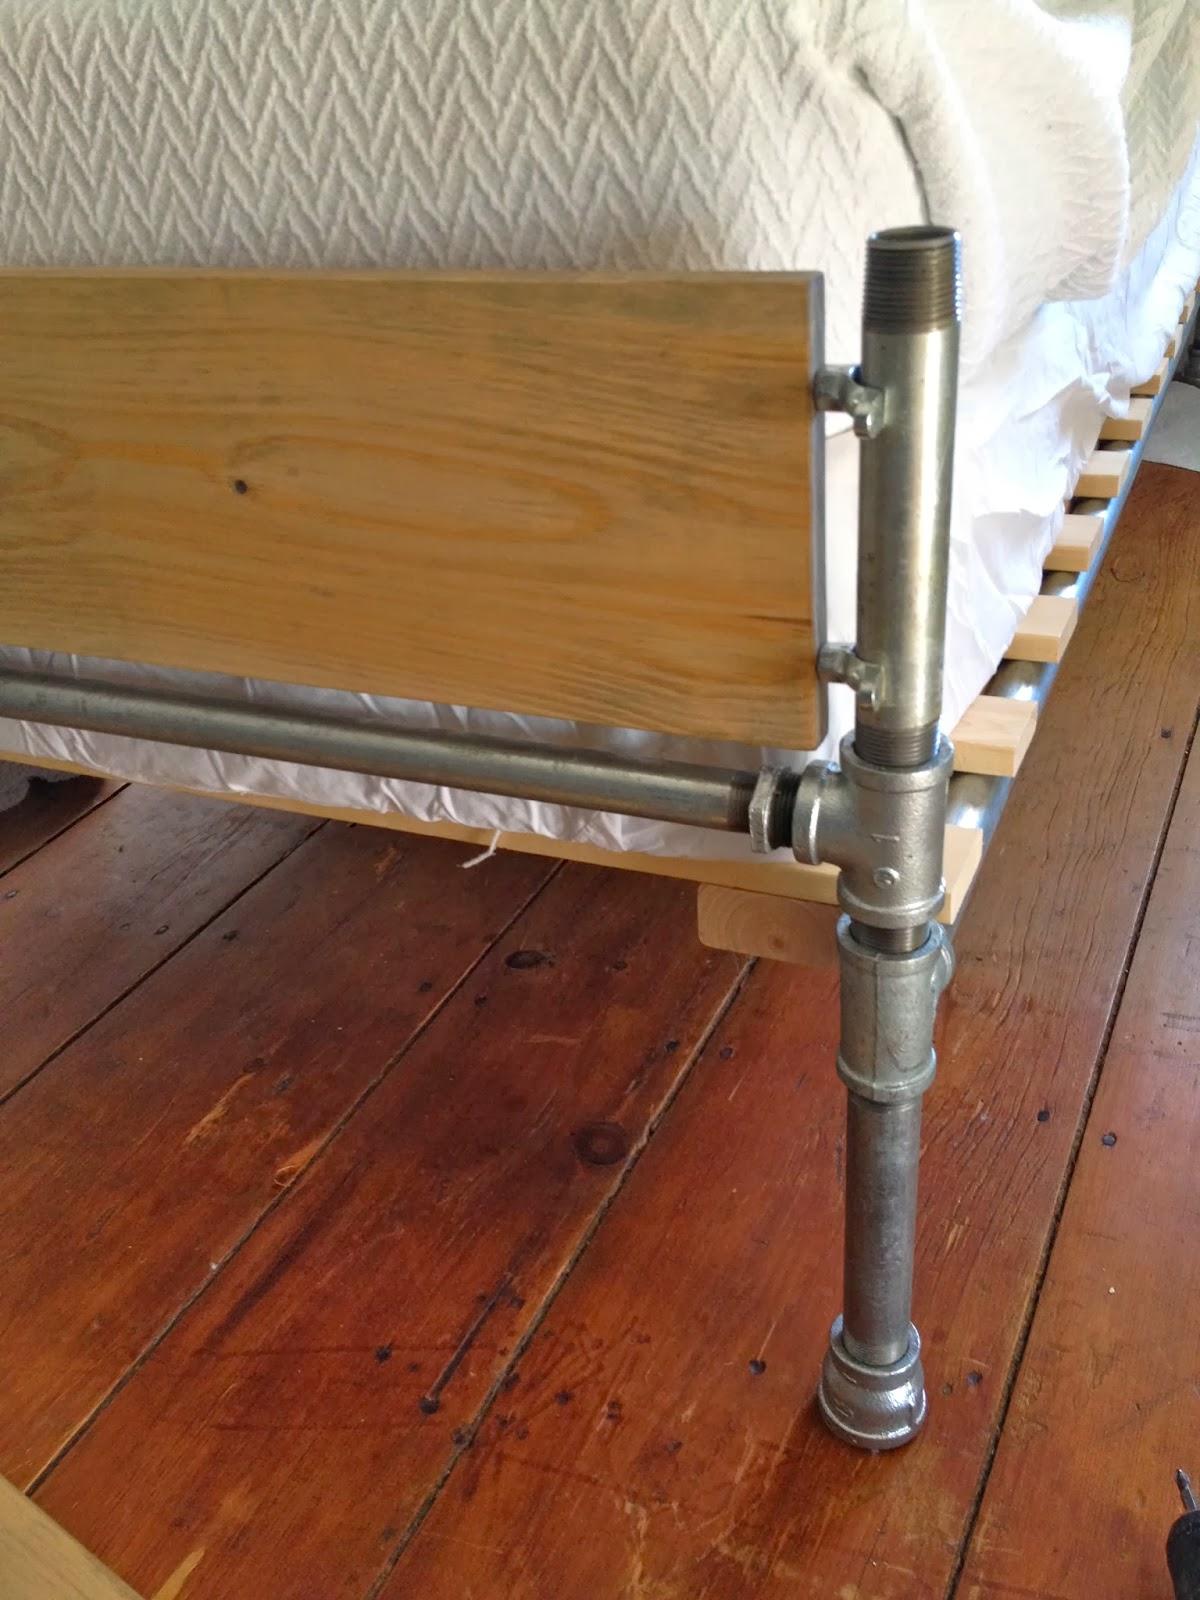 attaching wood slat to pipe leg